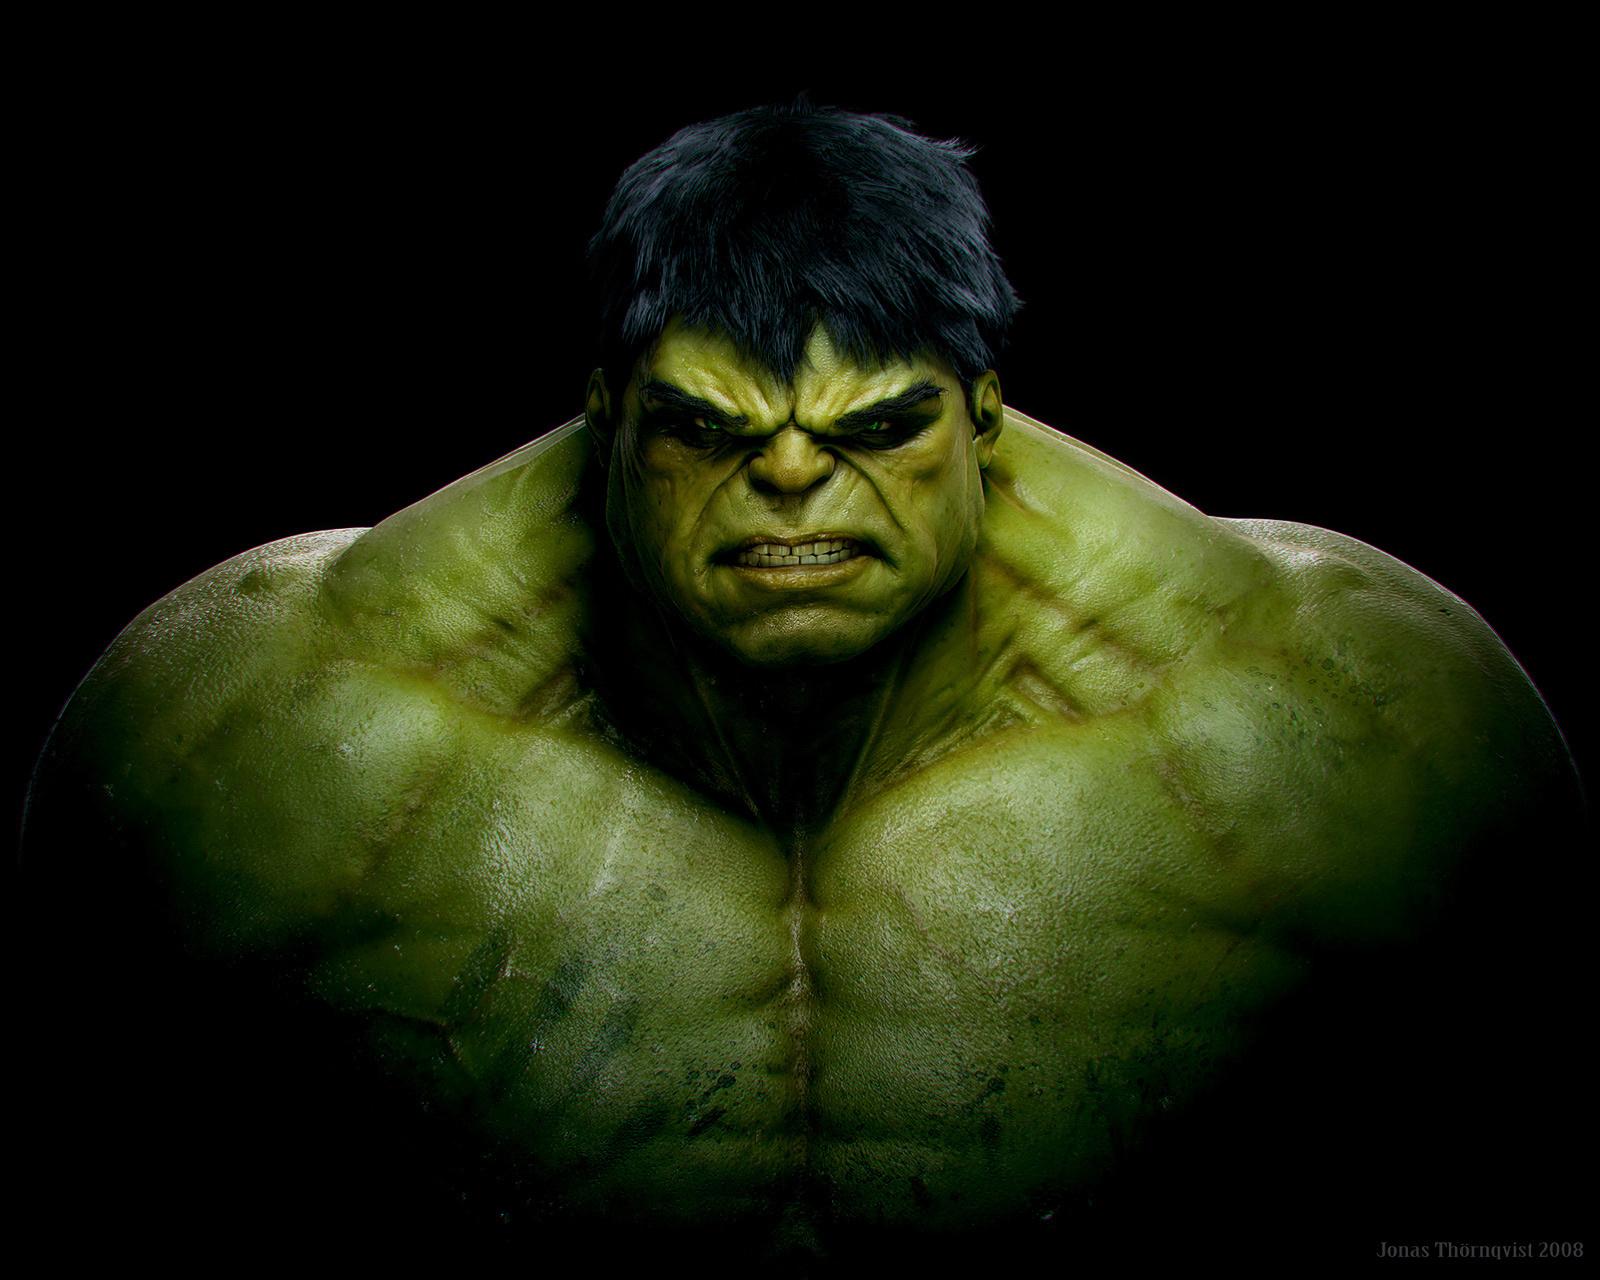 Http 1 Bp Blogspot Com B8amqtxq4co Upbloememzi Aaaaaaaaaty N73egfpf3v4 S1600 Download Hulk Hd Wallpaper For Computer Hulk Movie Hulk Marvel Incredible Hulk